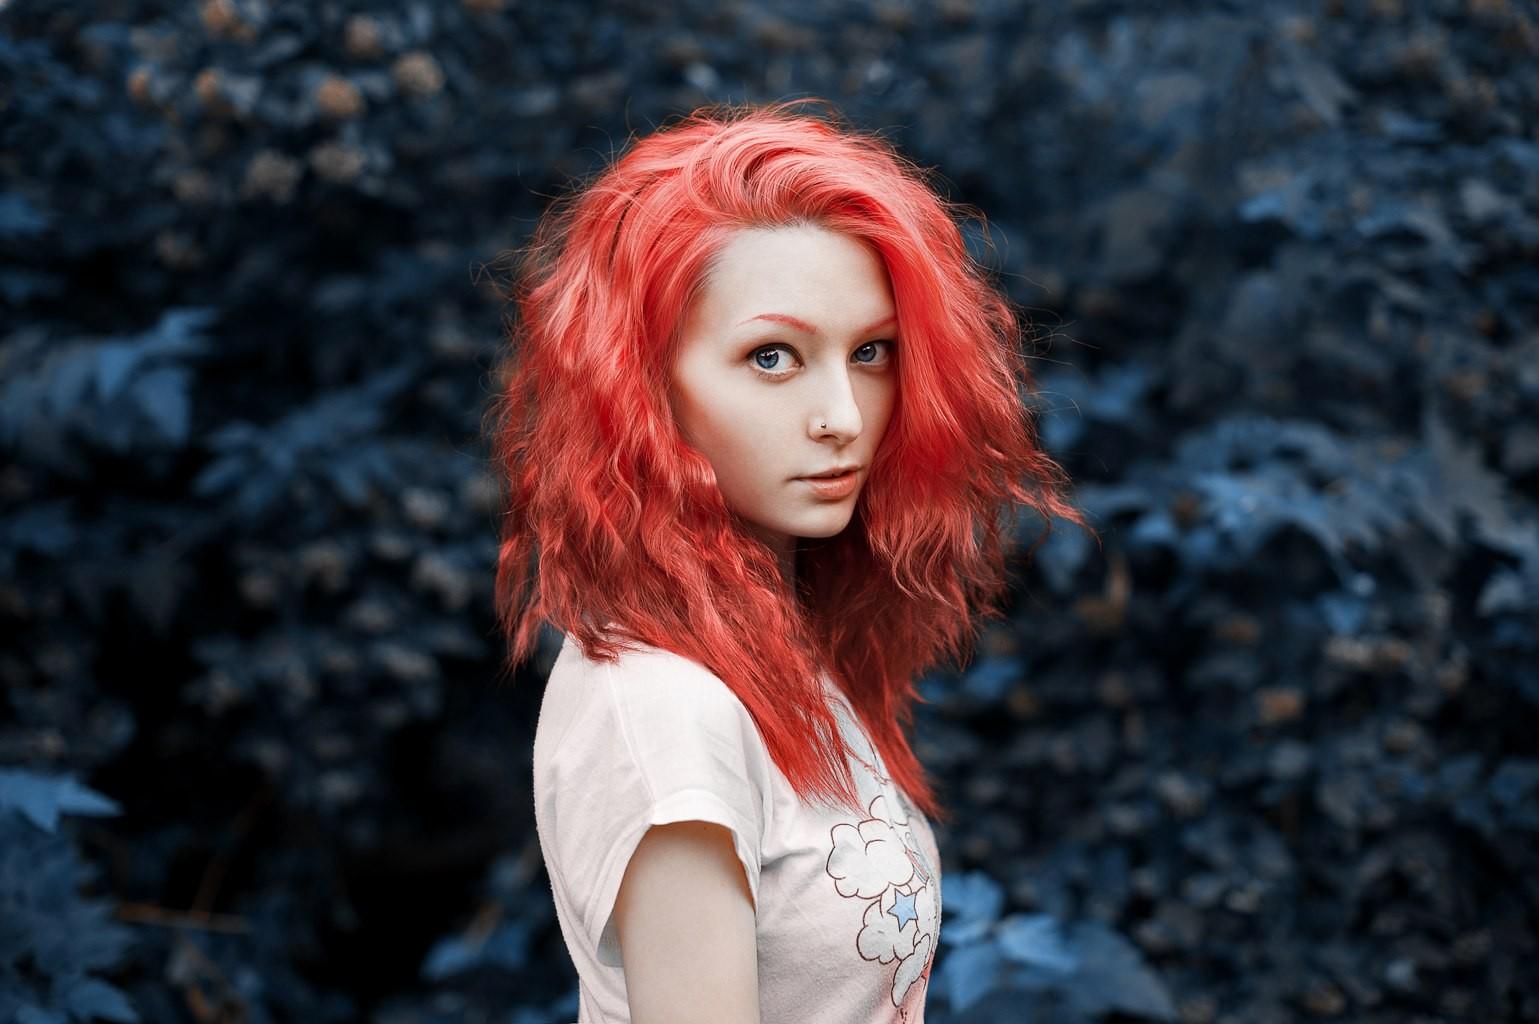 Wallpaper Face Women Redhead Model Dyed Hair Blue